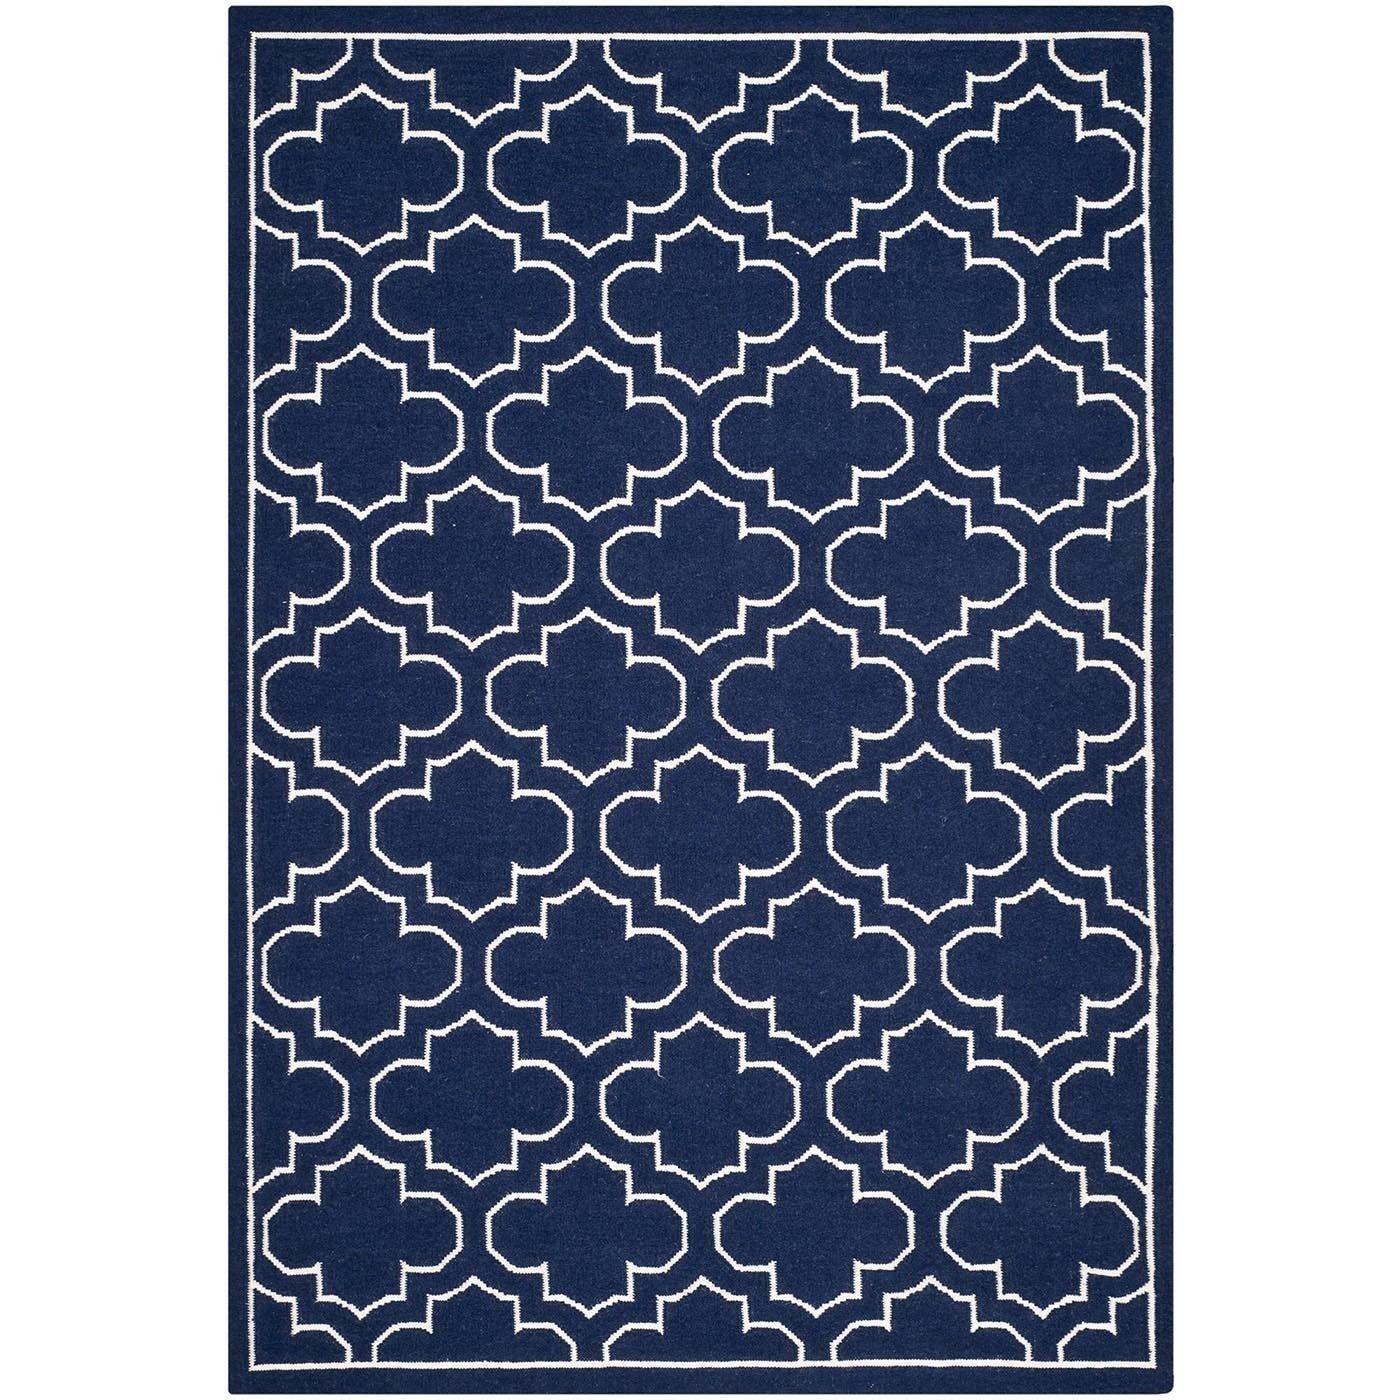 Safavieh Hand Woven Moroccan Reversible Dhurrie Navy Blue Wool Rug